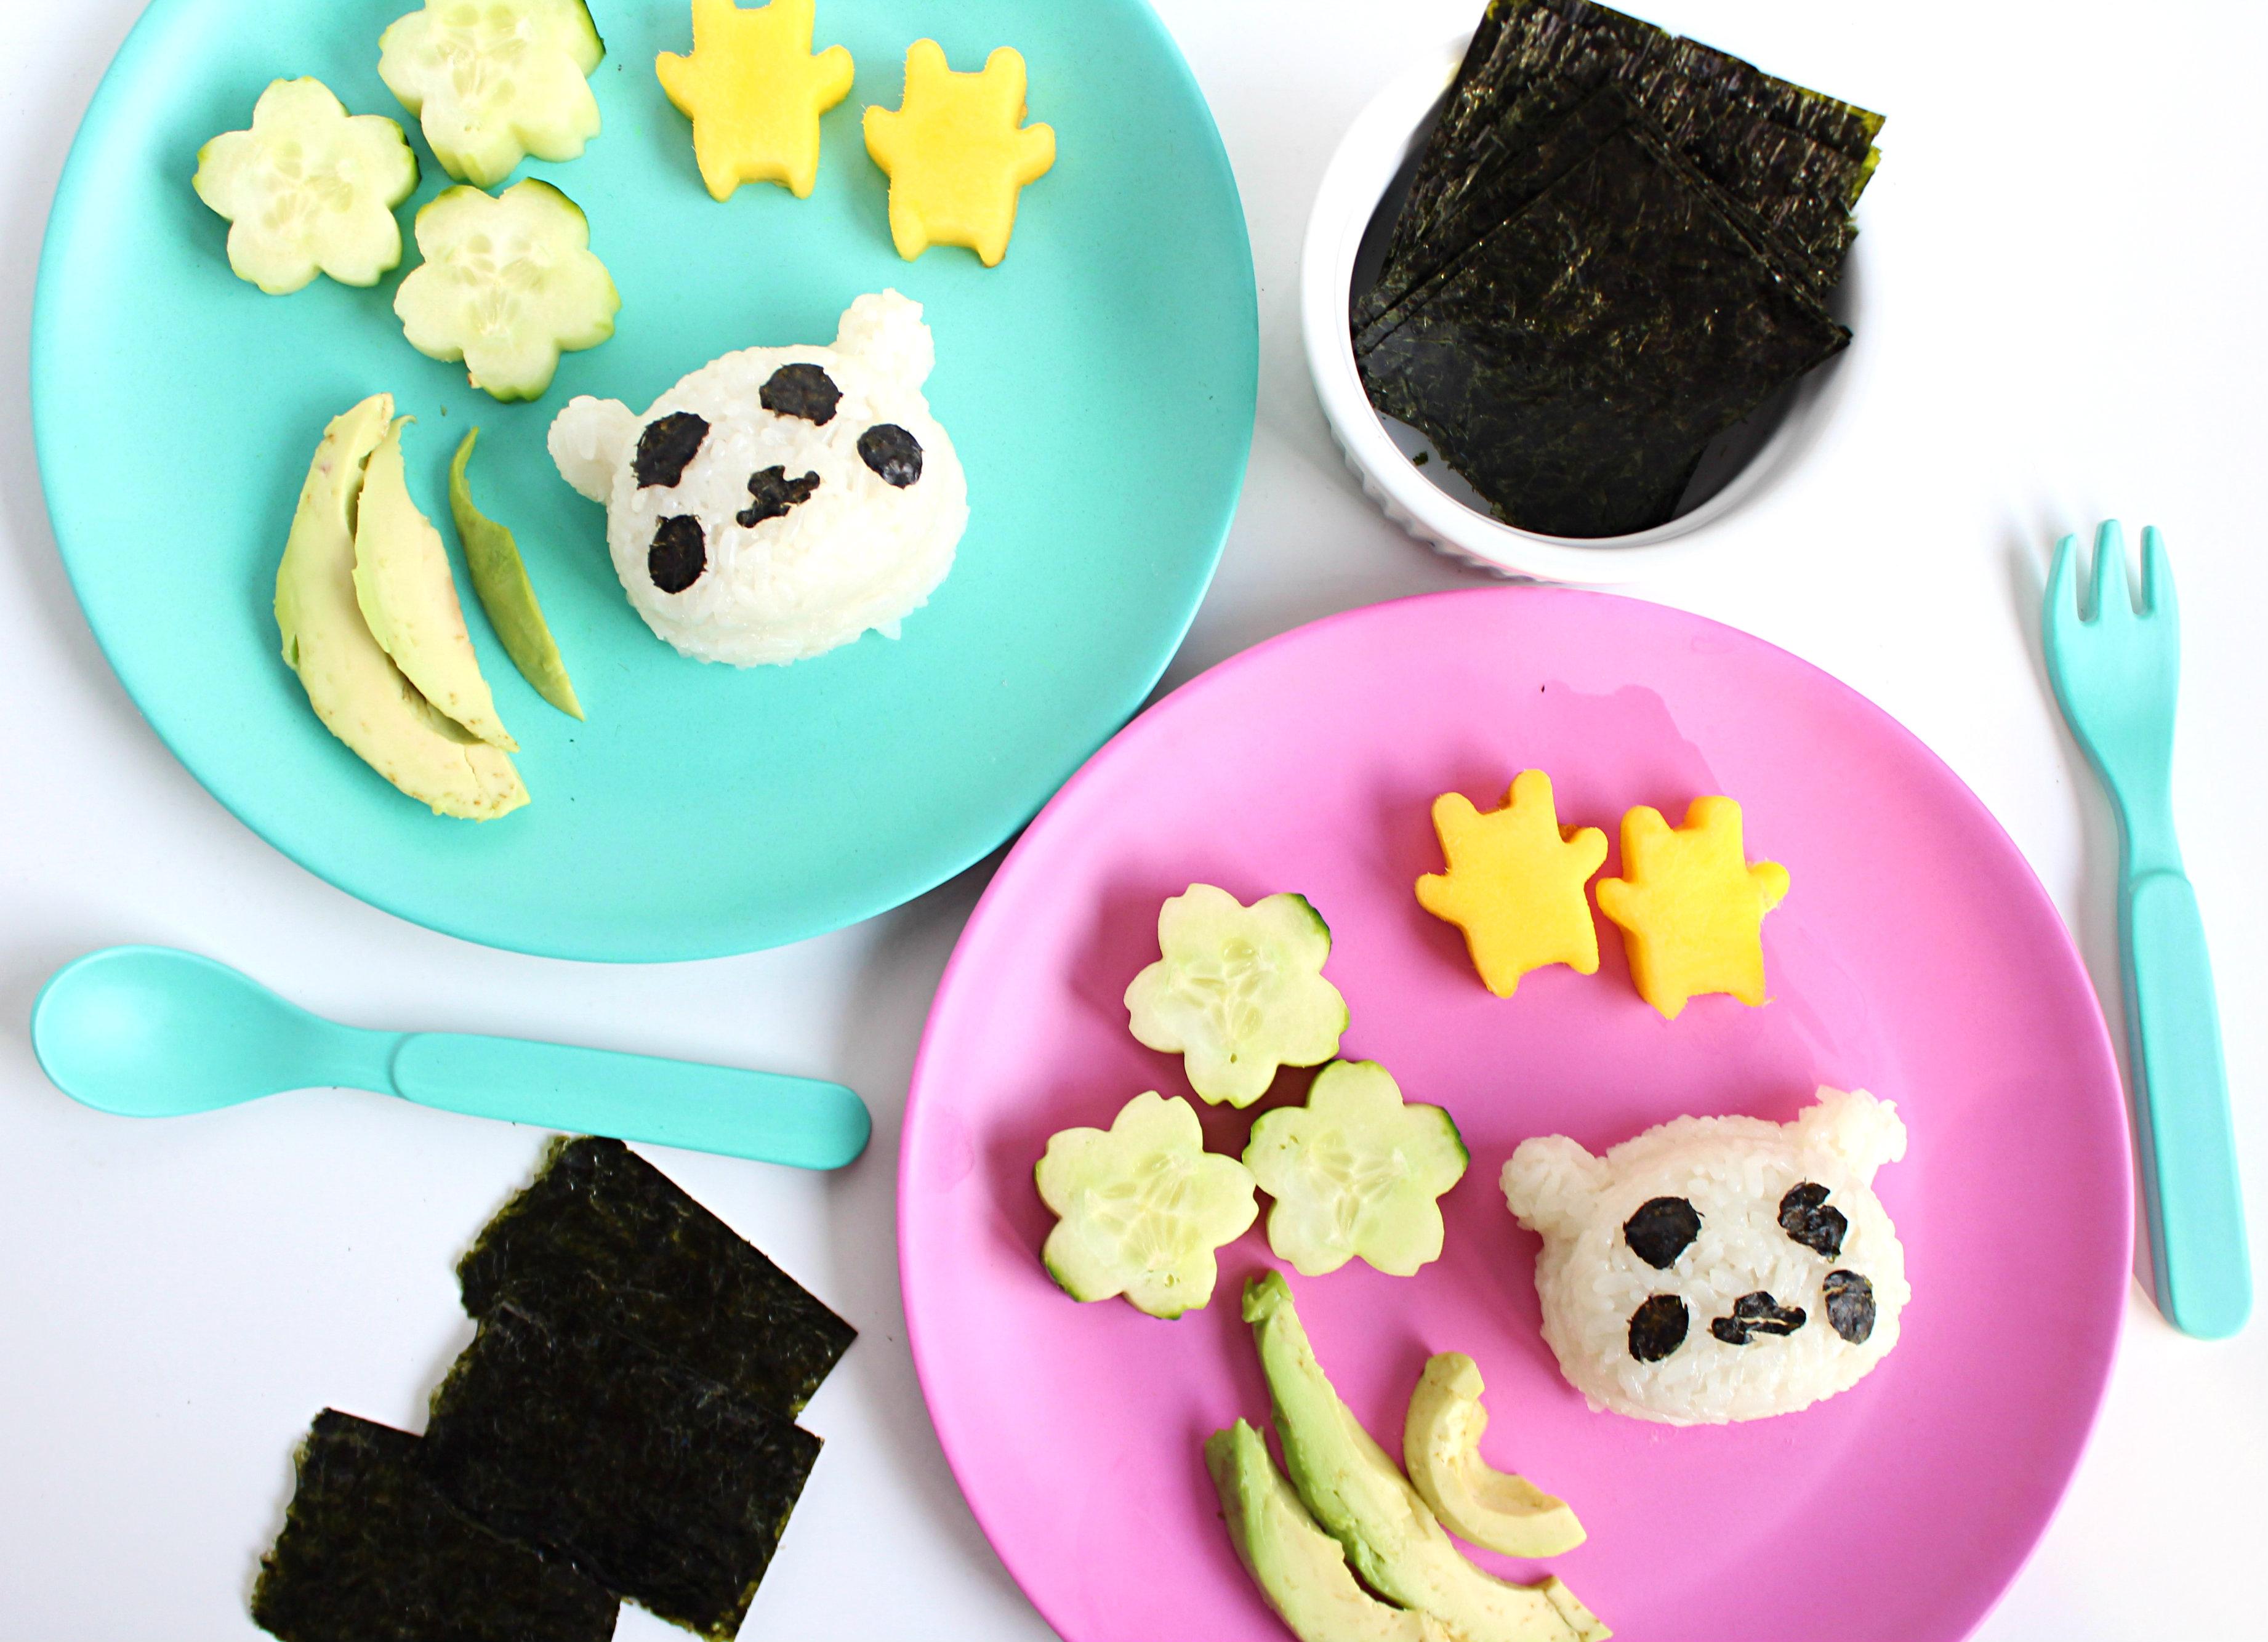 DIY Panda sushi for kids and toddlers.